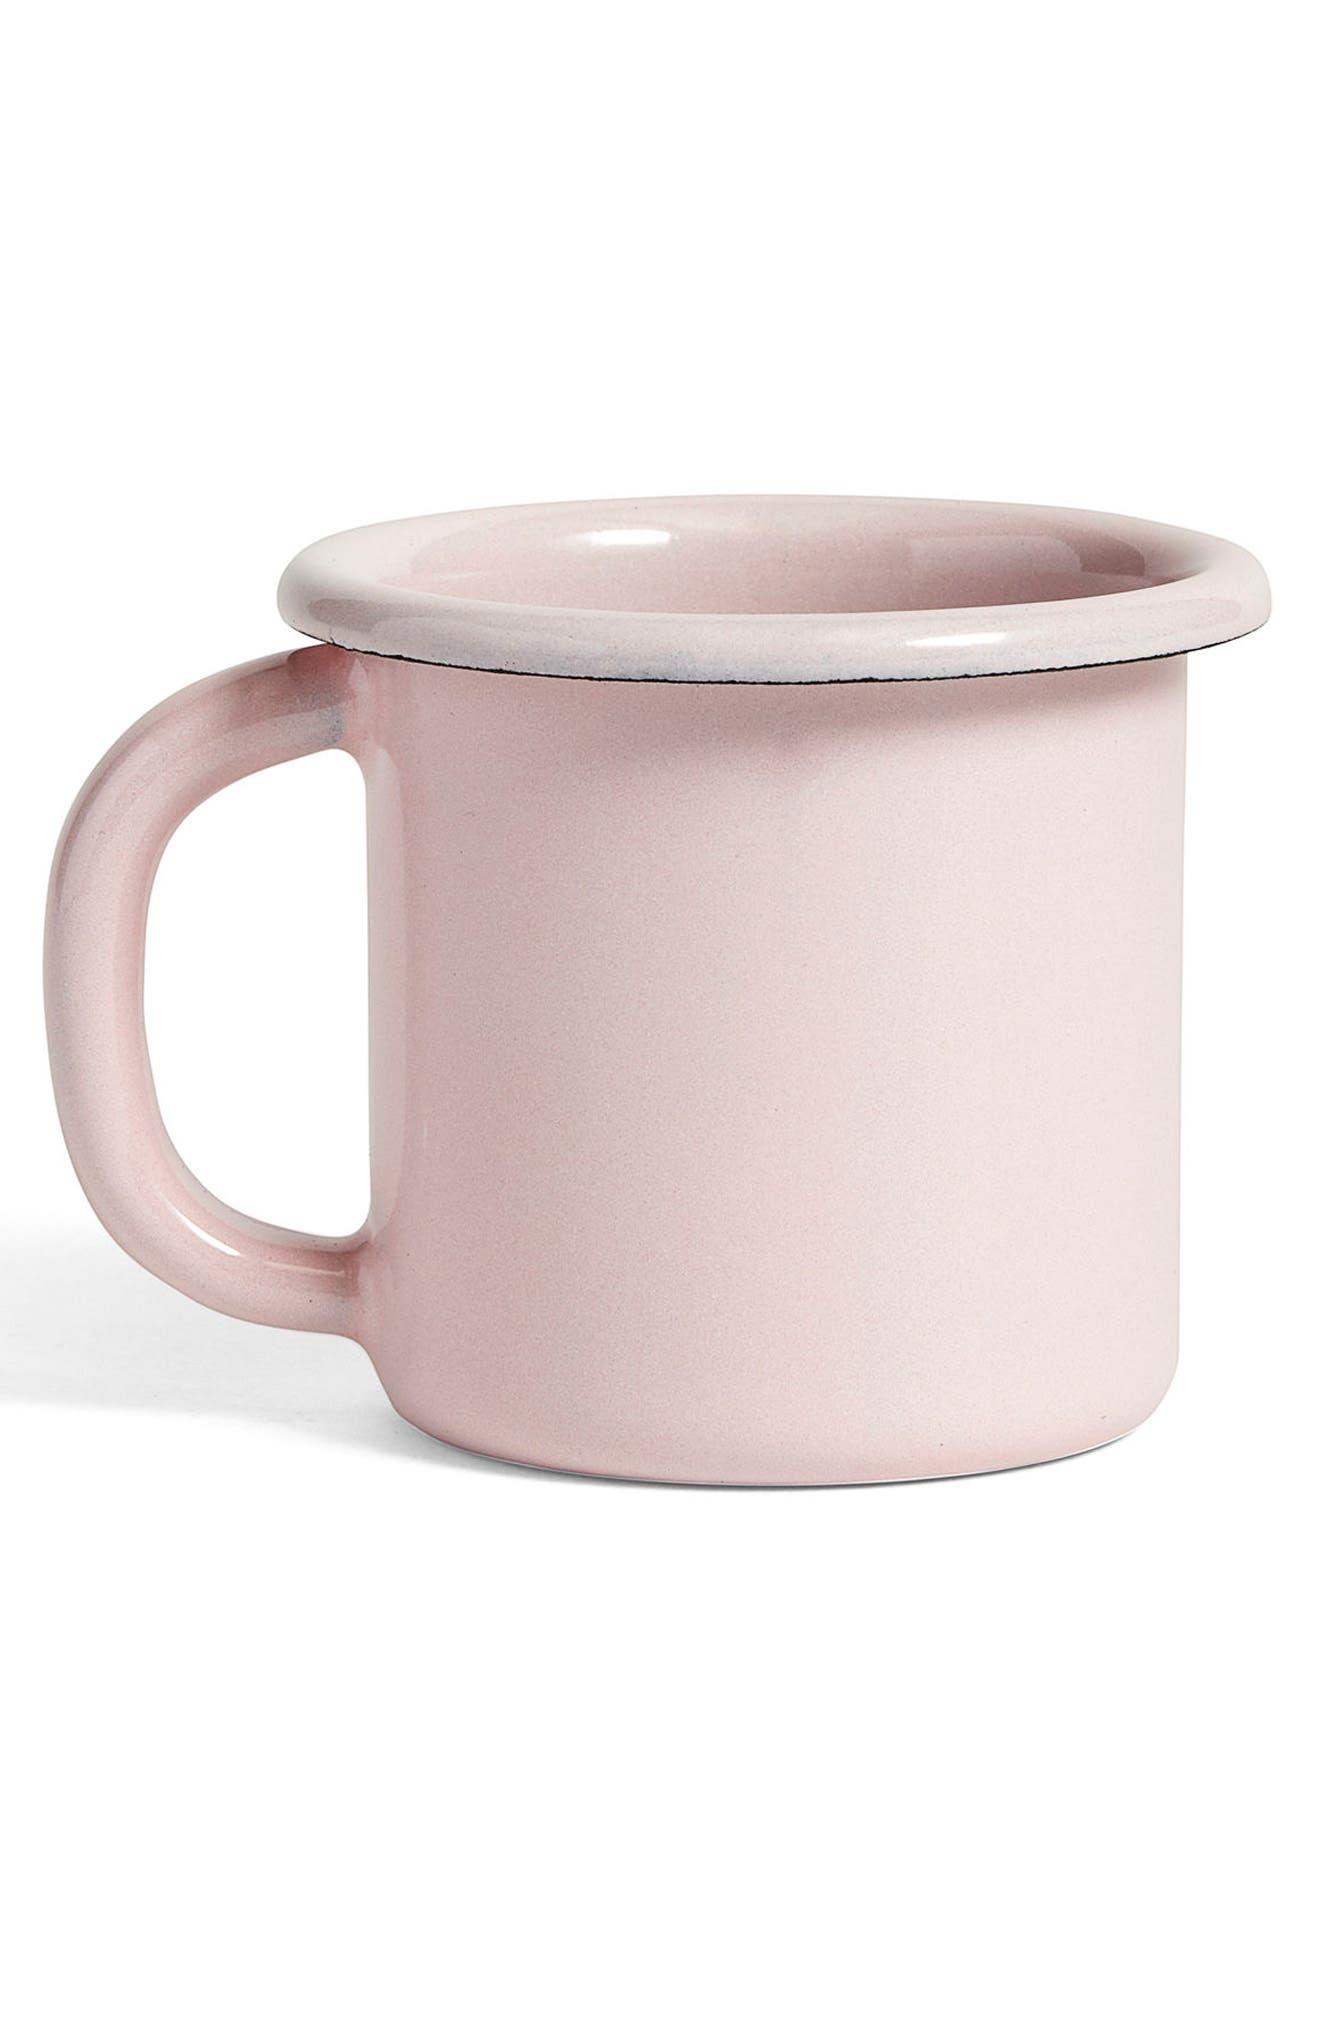 Enamel Mug,                             Alternate thumbnail 3, color,                             Soft Pink